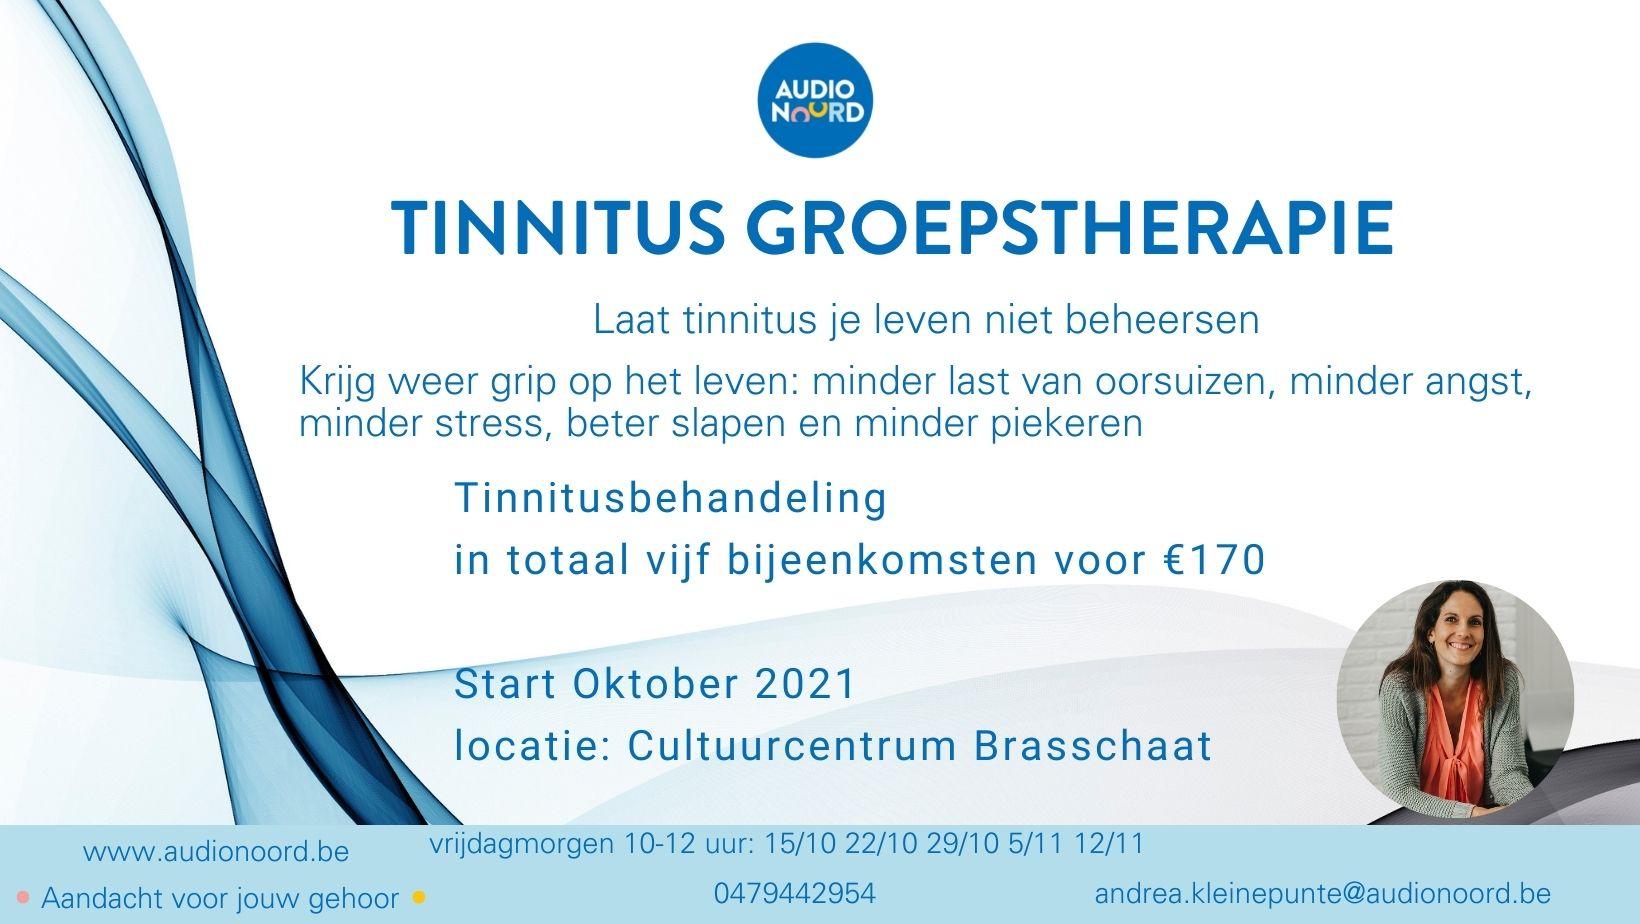 Tinnitusbehandeling